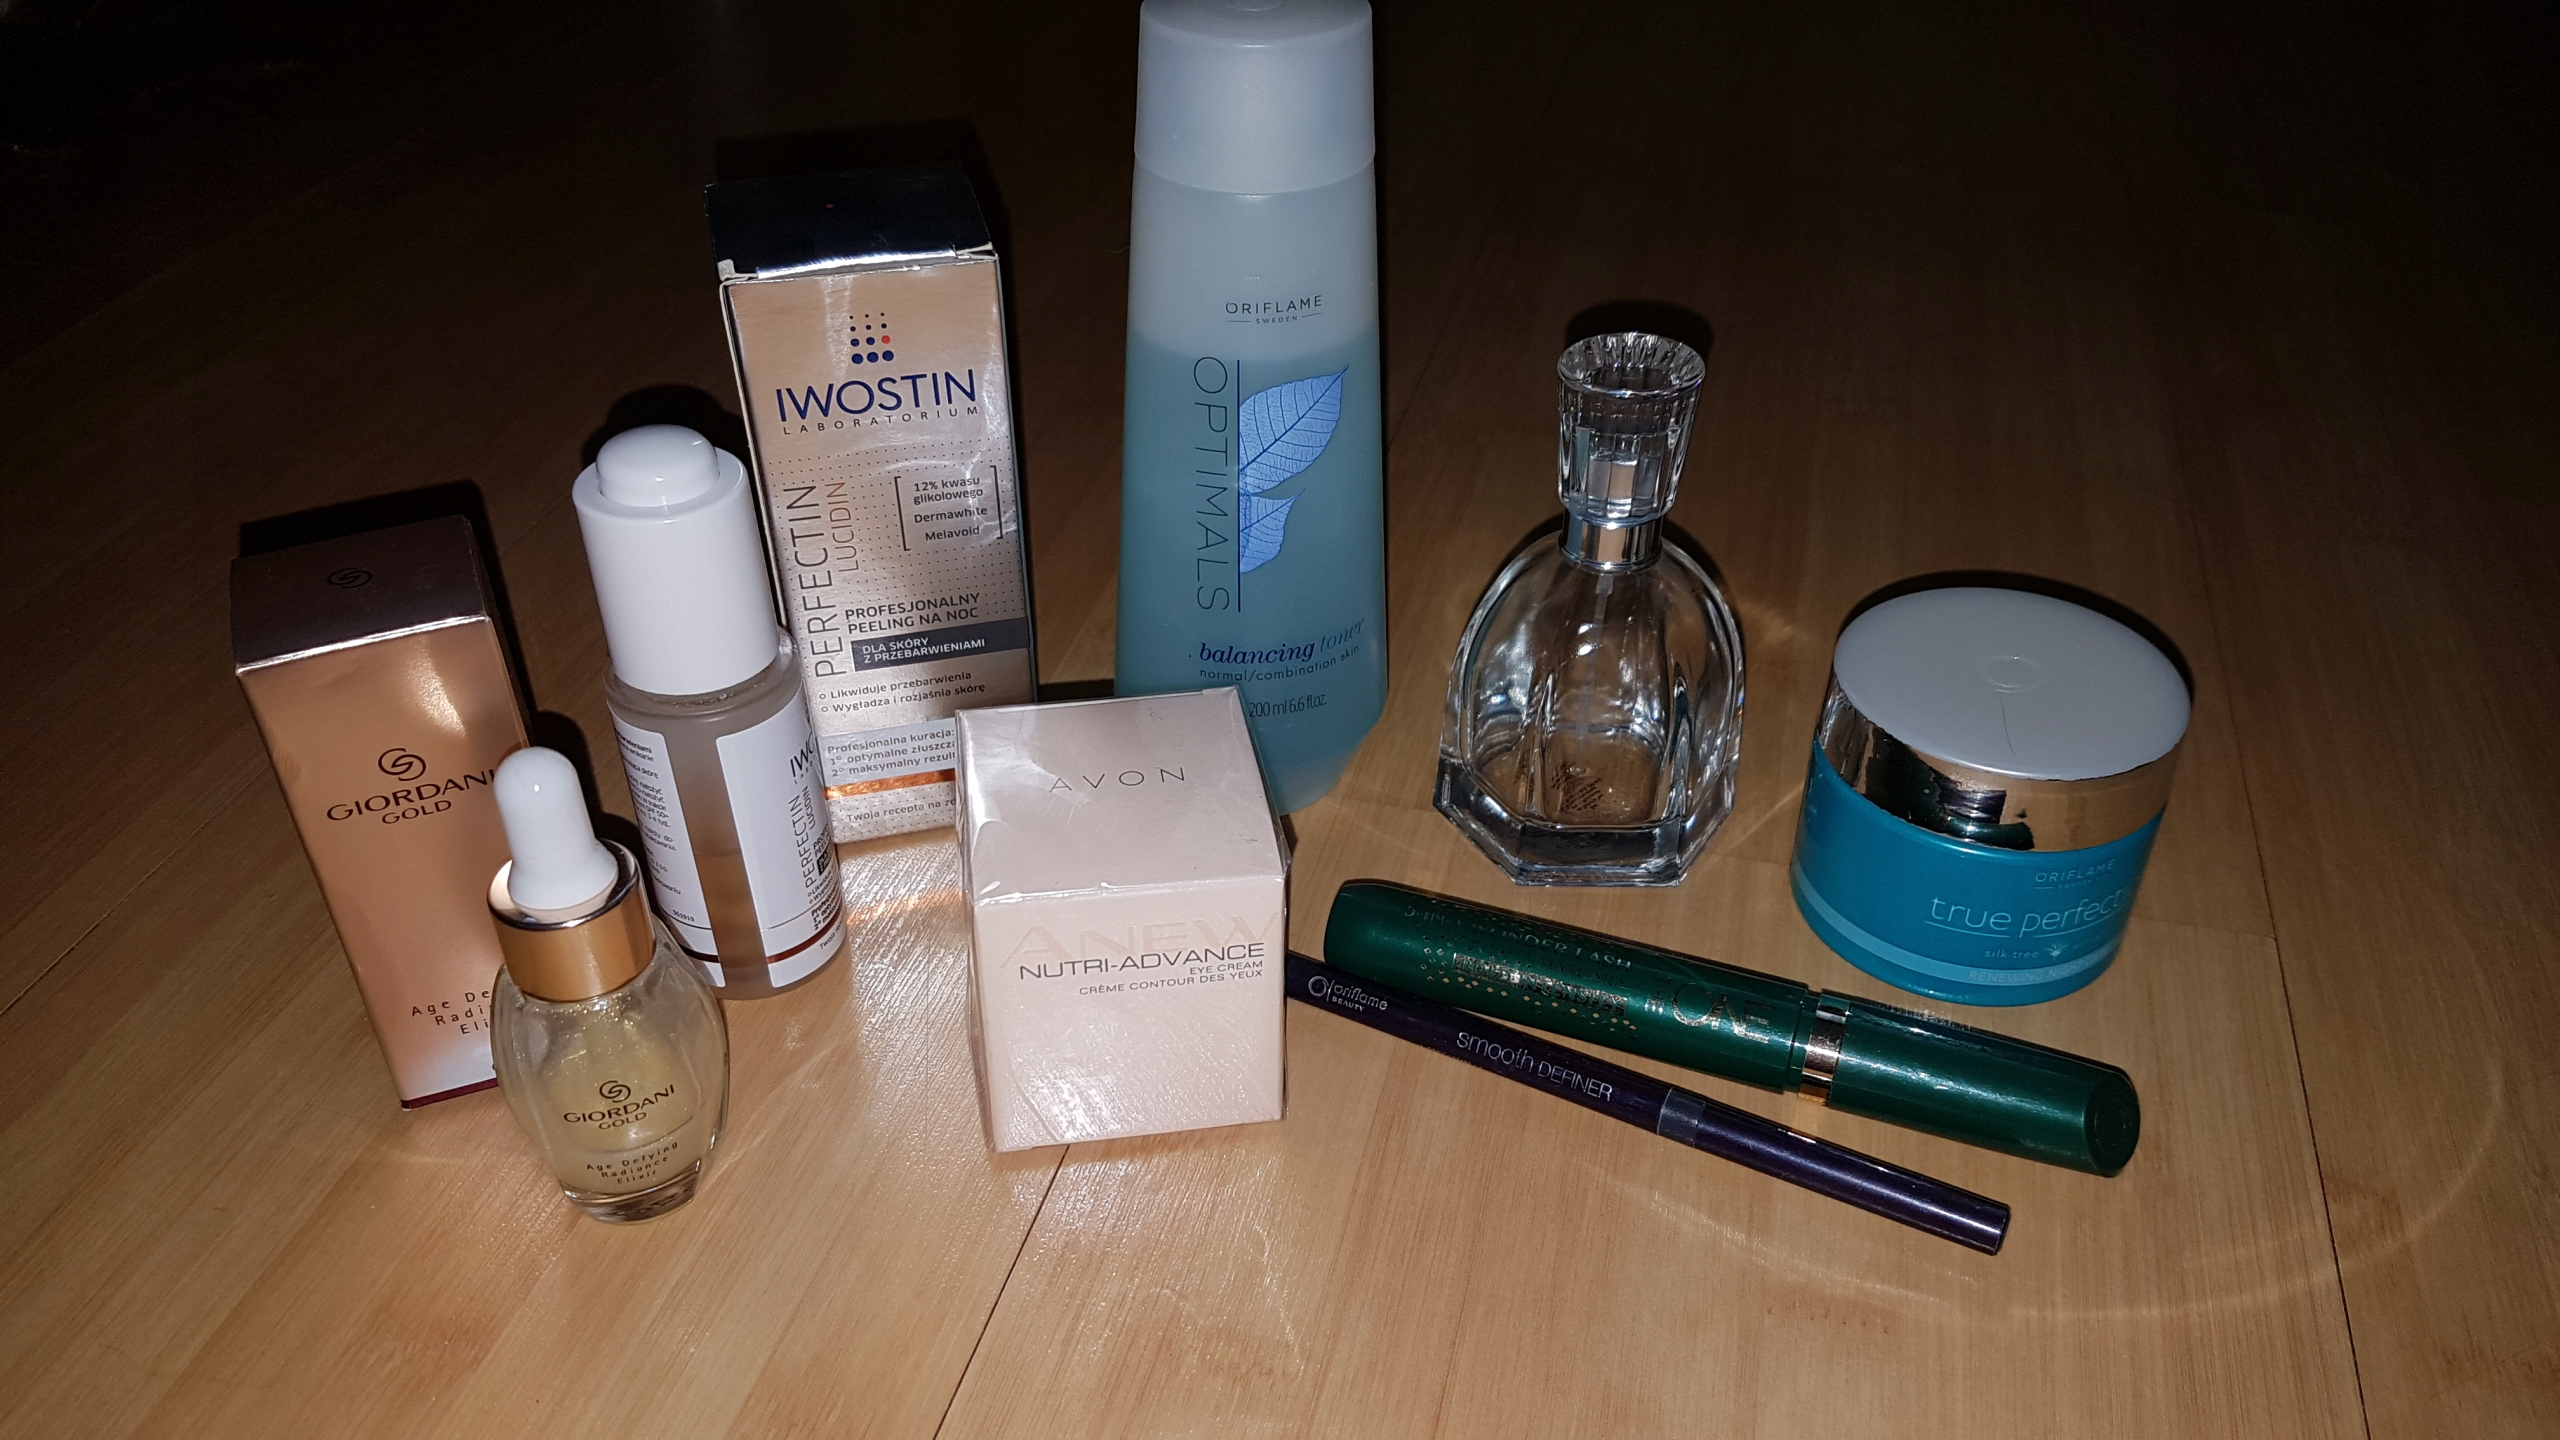 zestaw kosmetyków ORIFLAME AVON IWOSTIN peeling